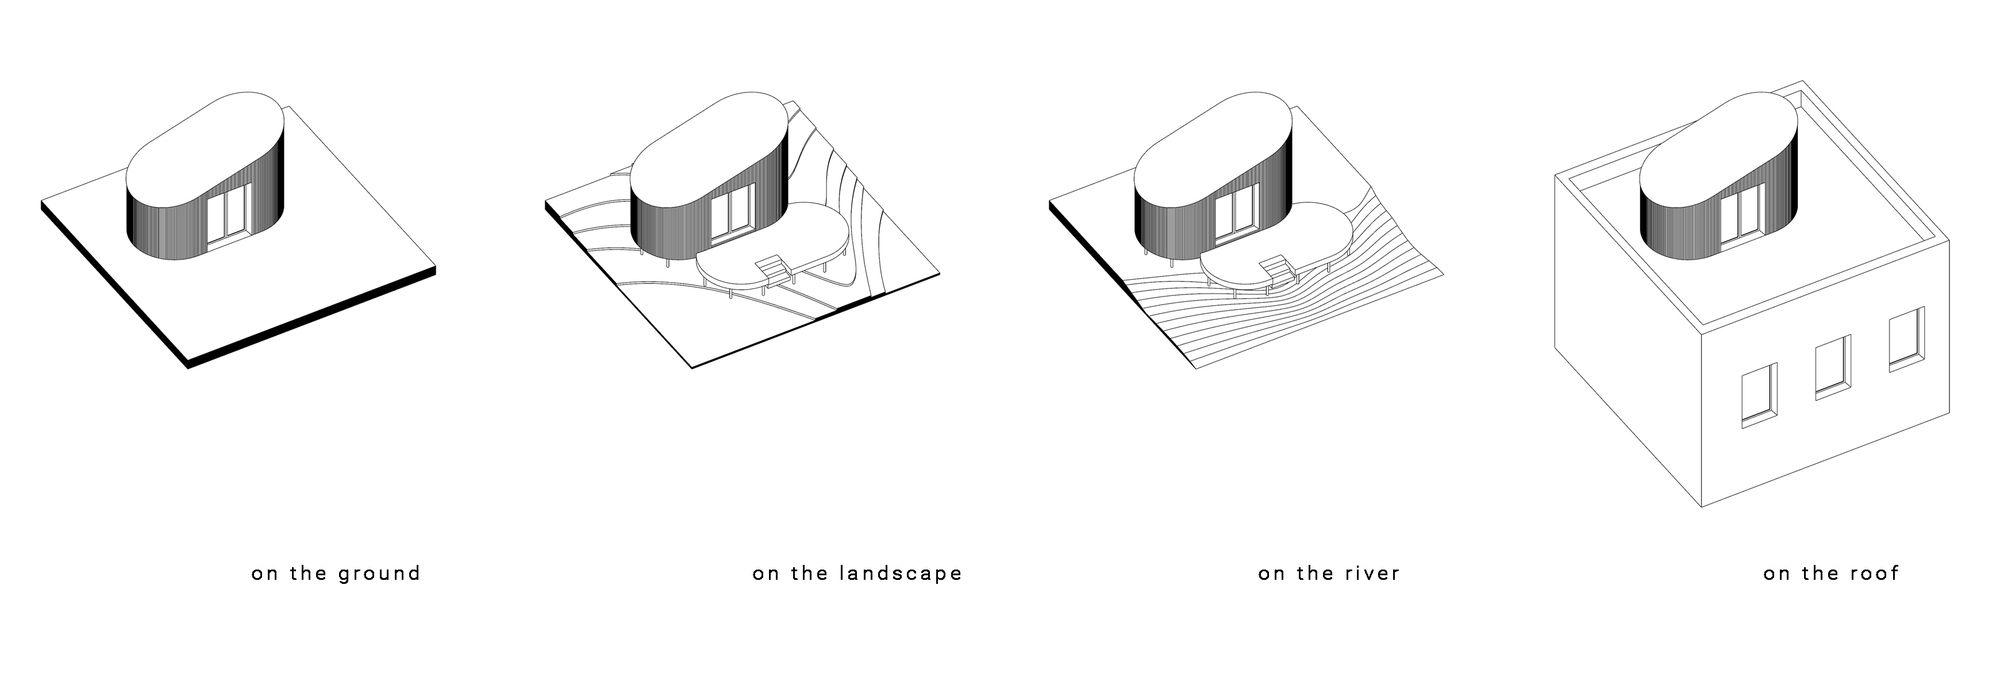 FLEXSE   Modular Tiny Cabin by SA lab